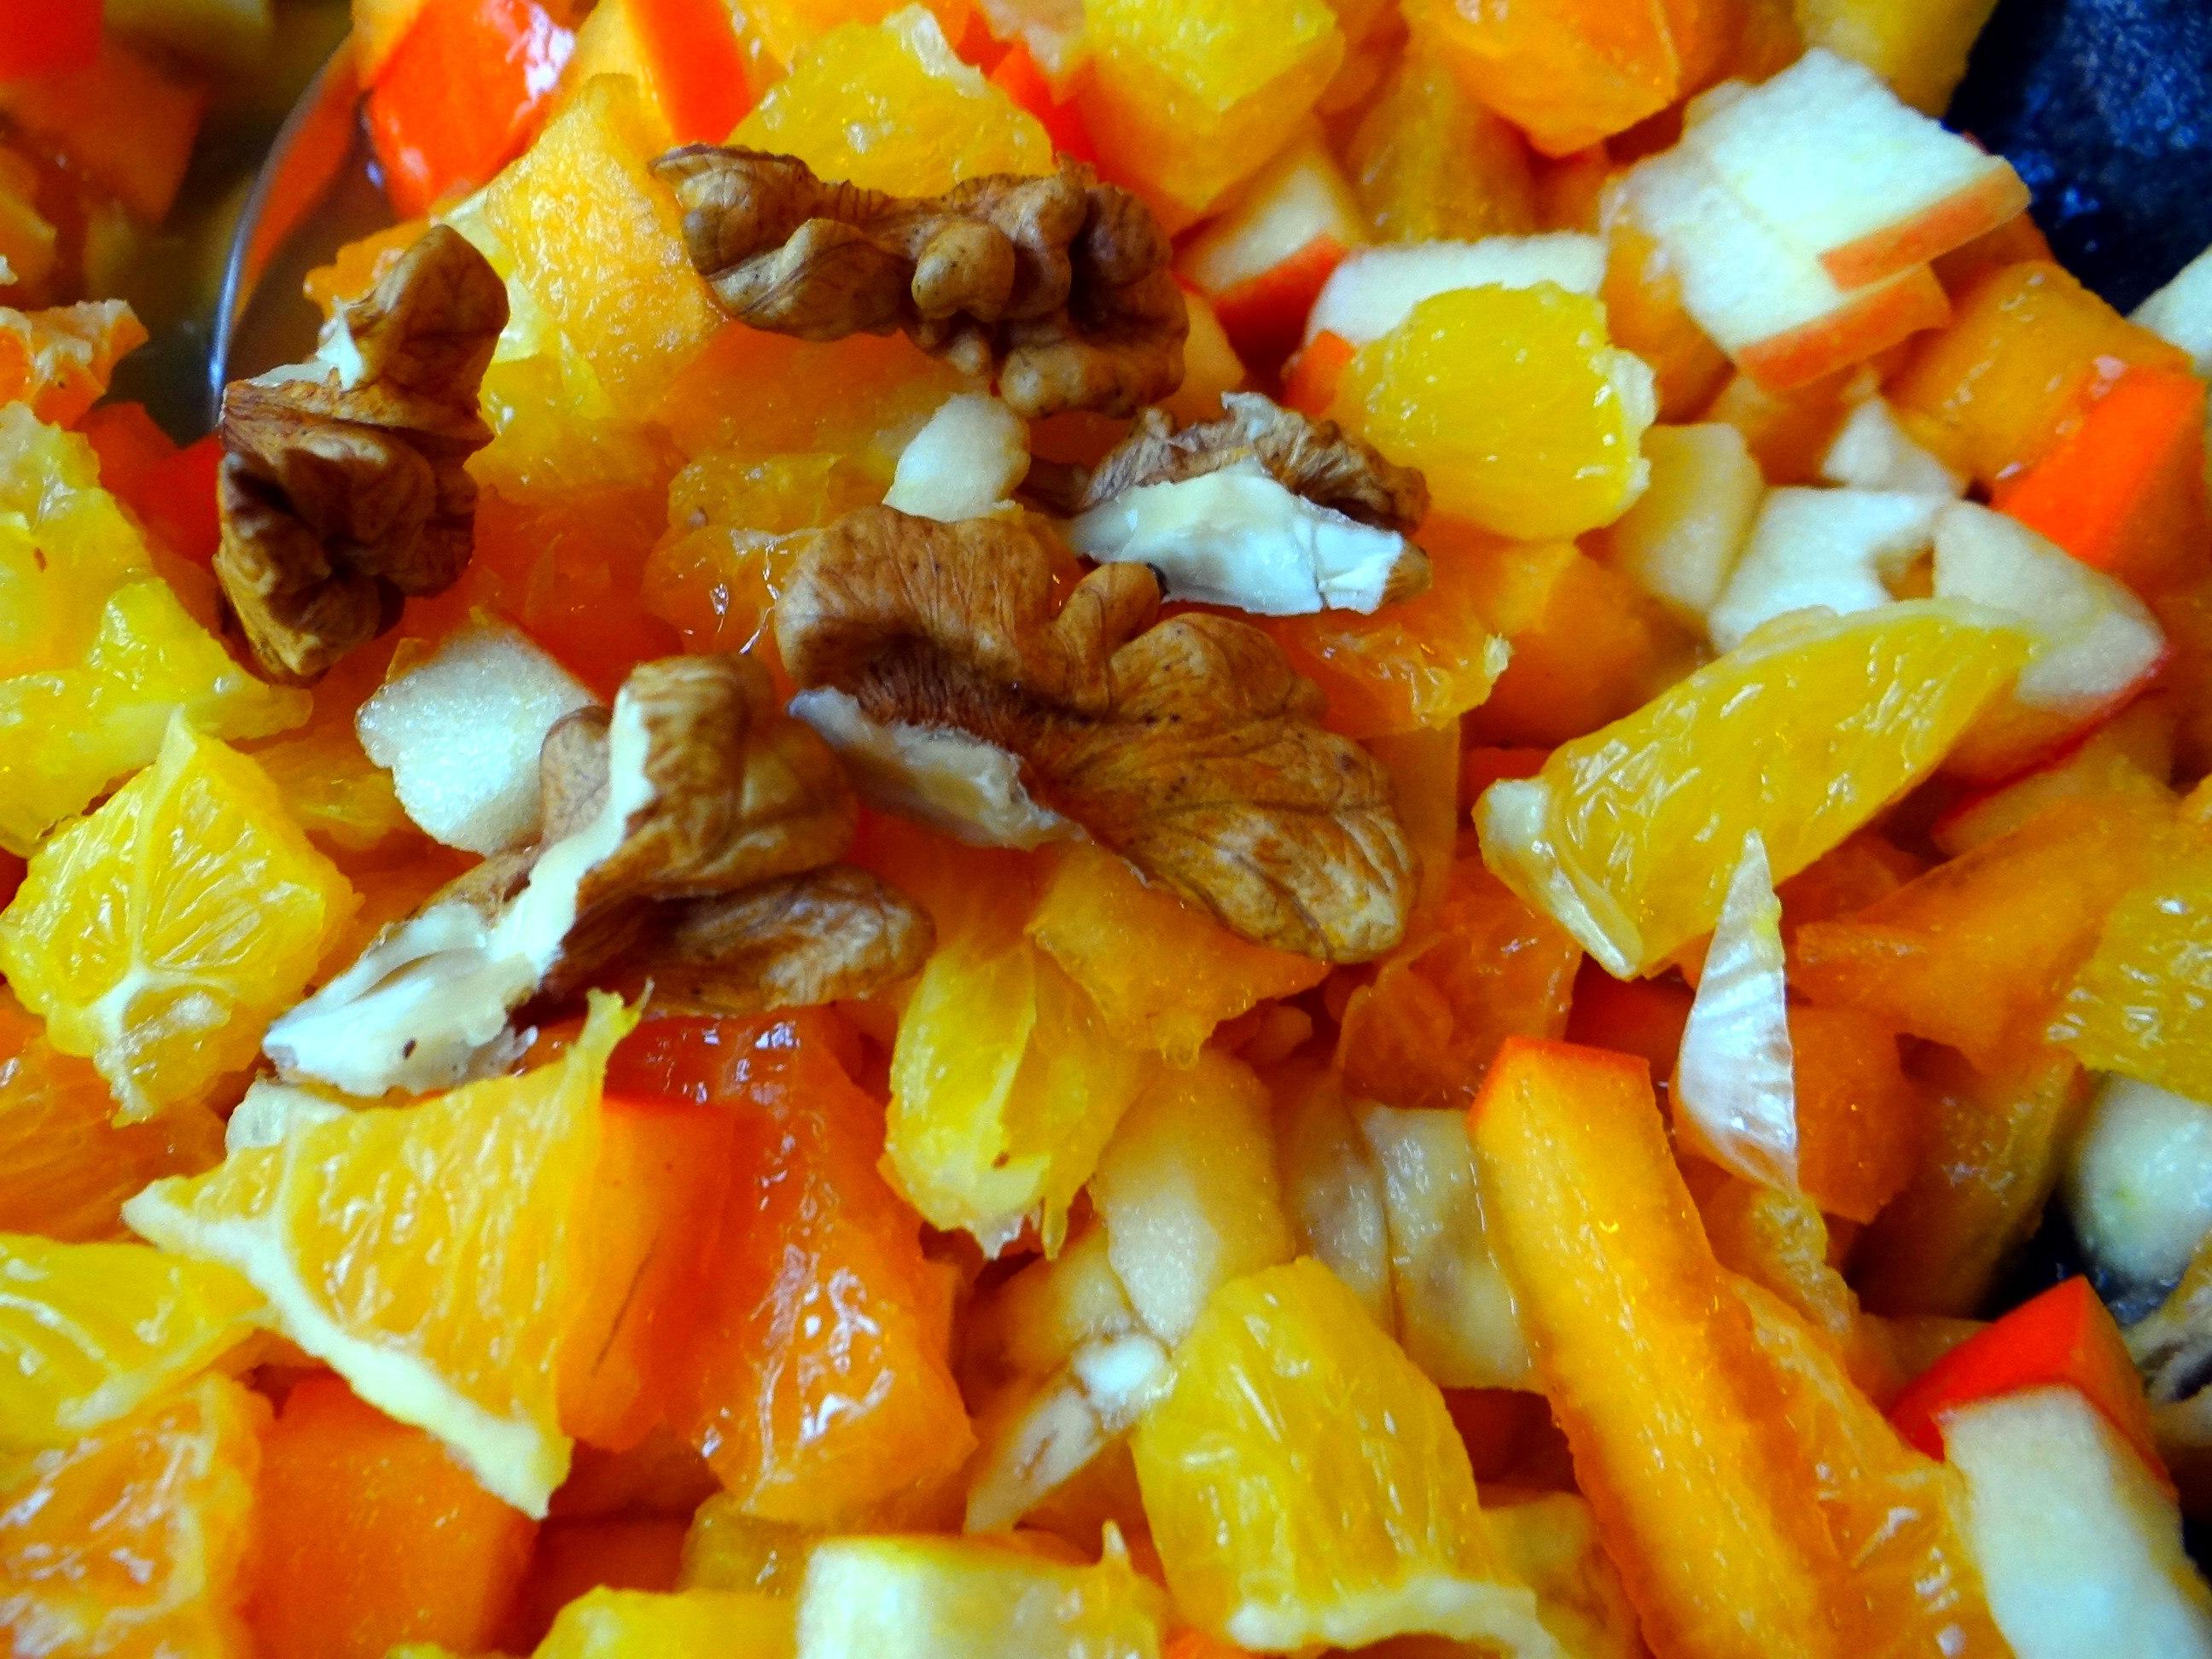 Rote Beete Gemüse,Geräucherte Forelle,Kartoffeln,Obstsalat (18)